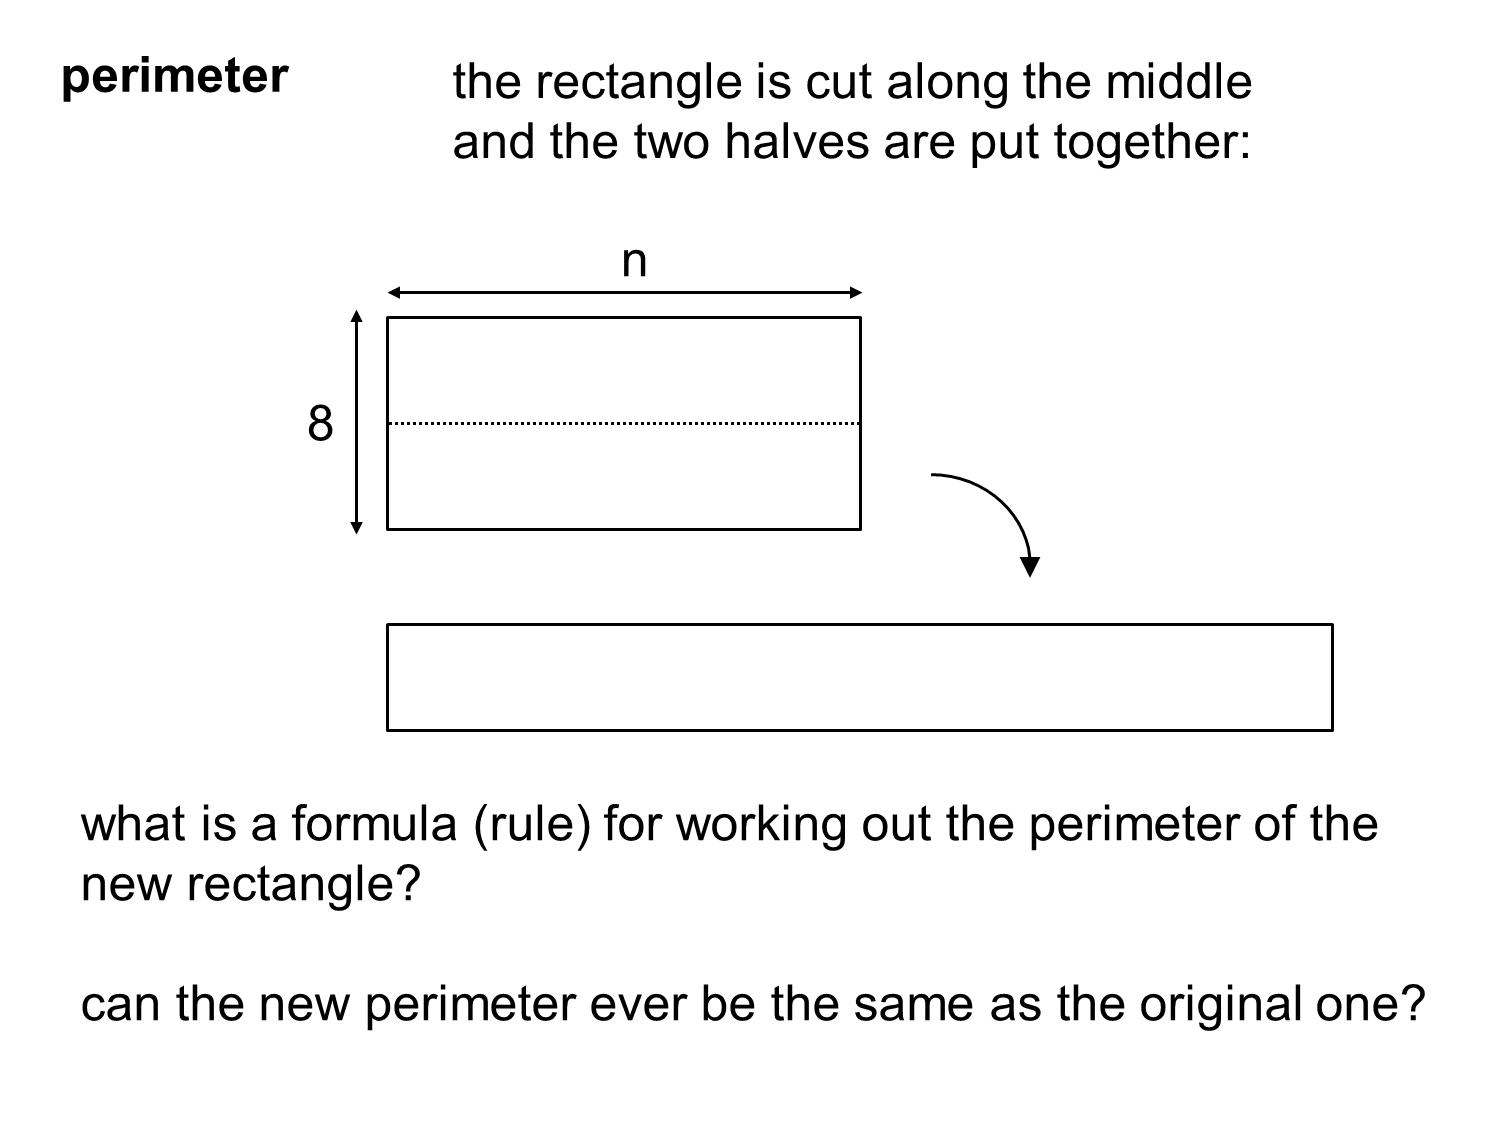 (ks3, L4 To L6, Year 2000, Paper 1, Question 14)